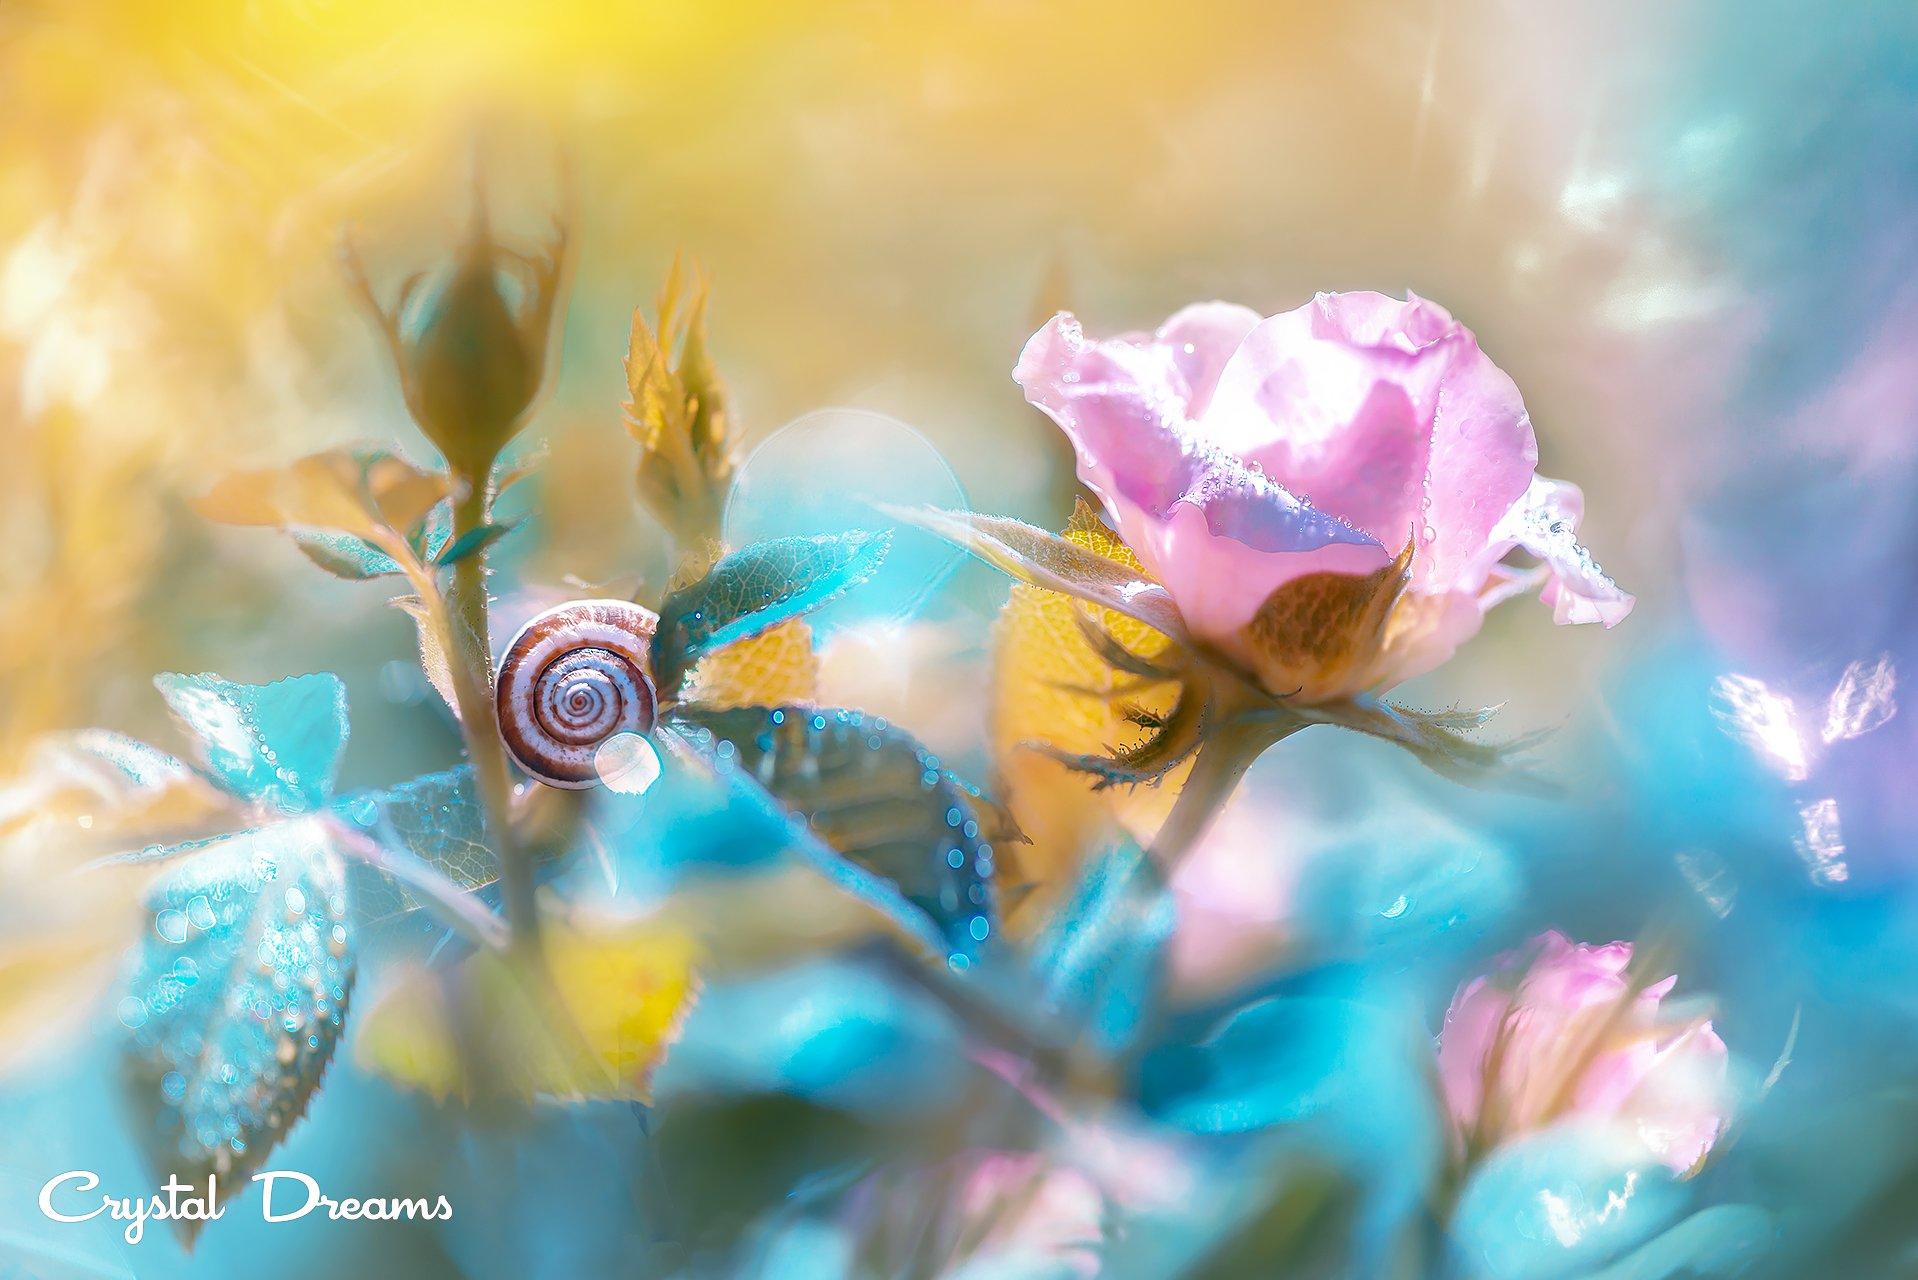 crystal dreams, macro, summer, color, art, nature, flowers, snail, Крылова Татьяна